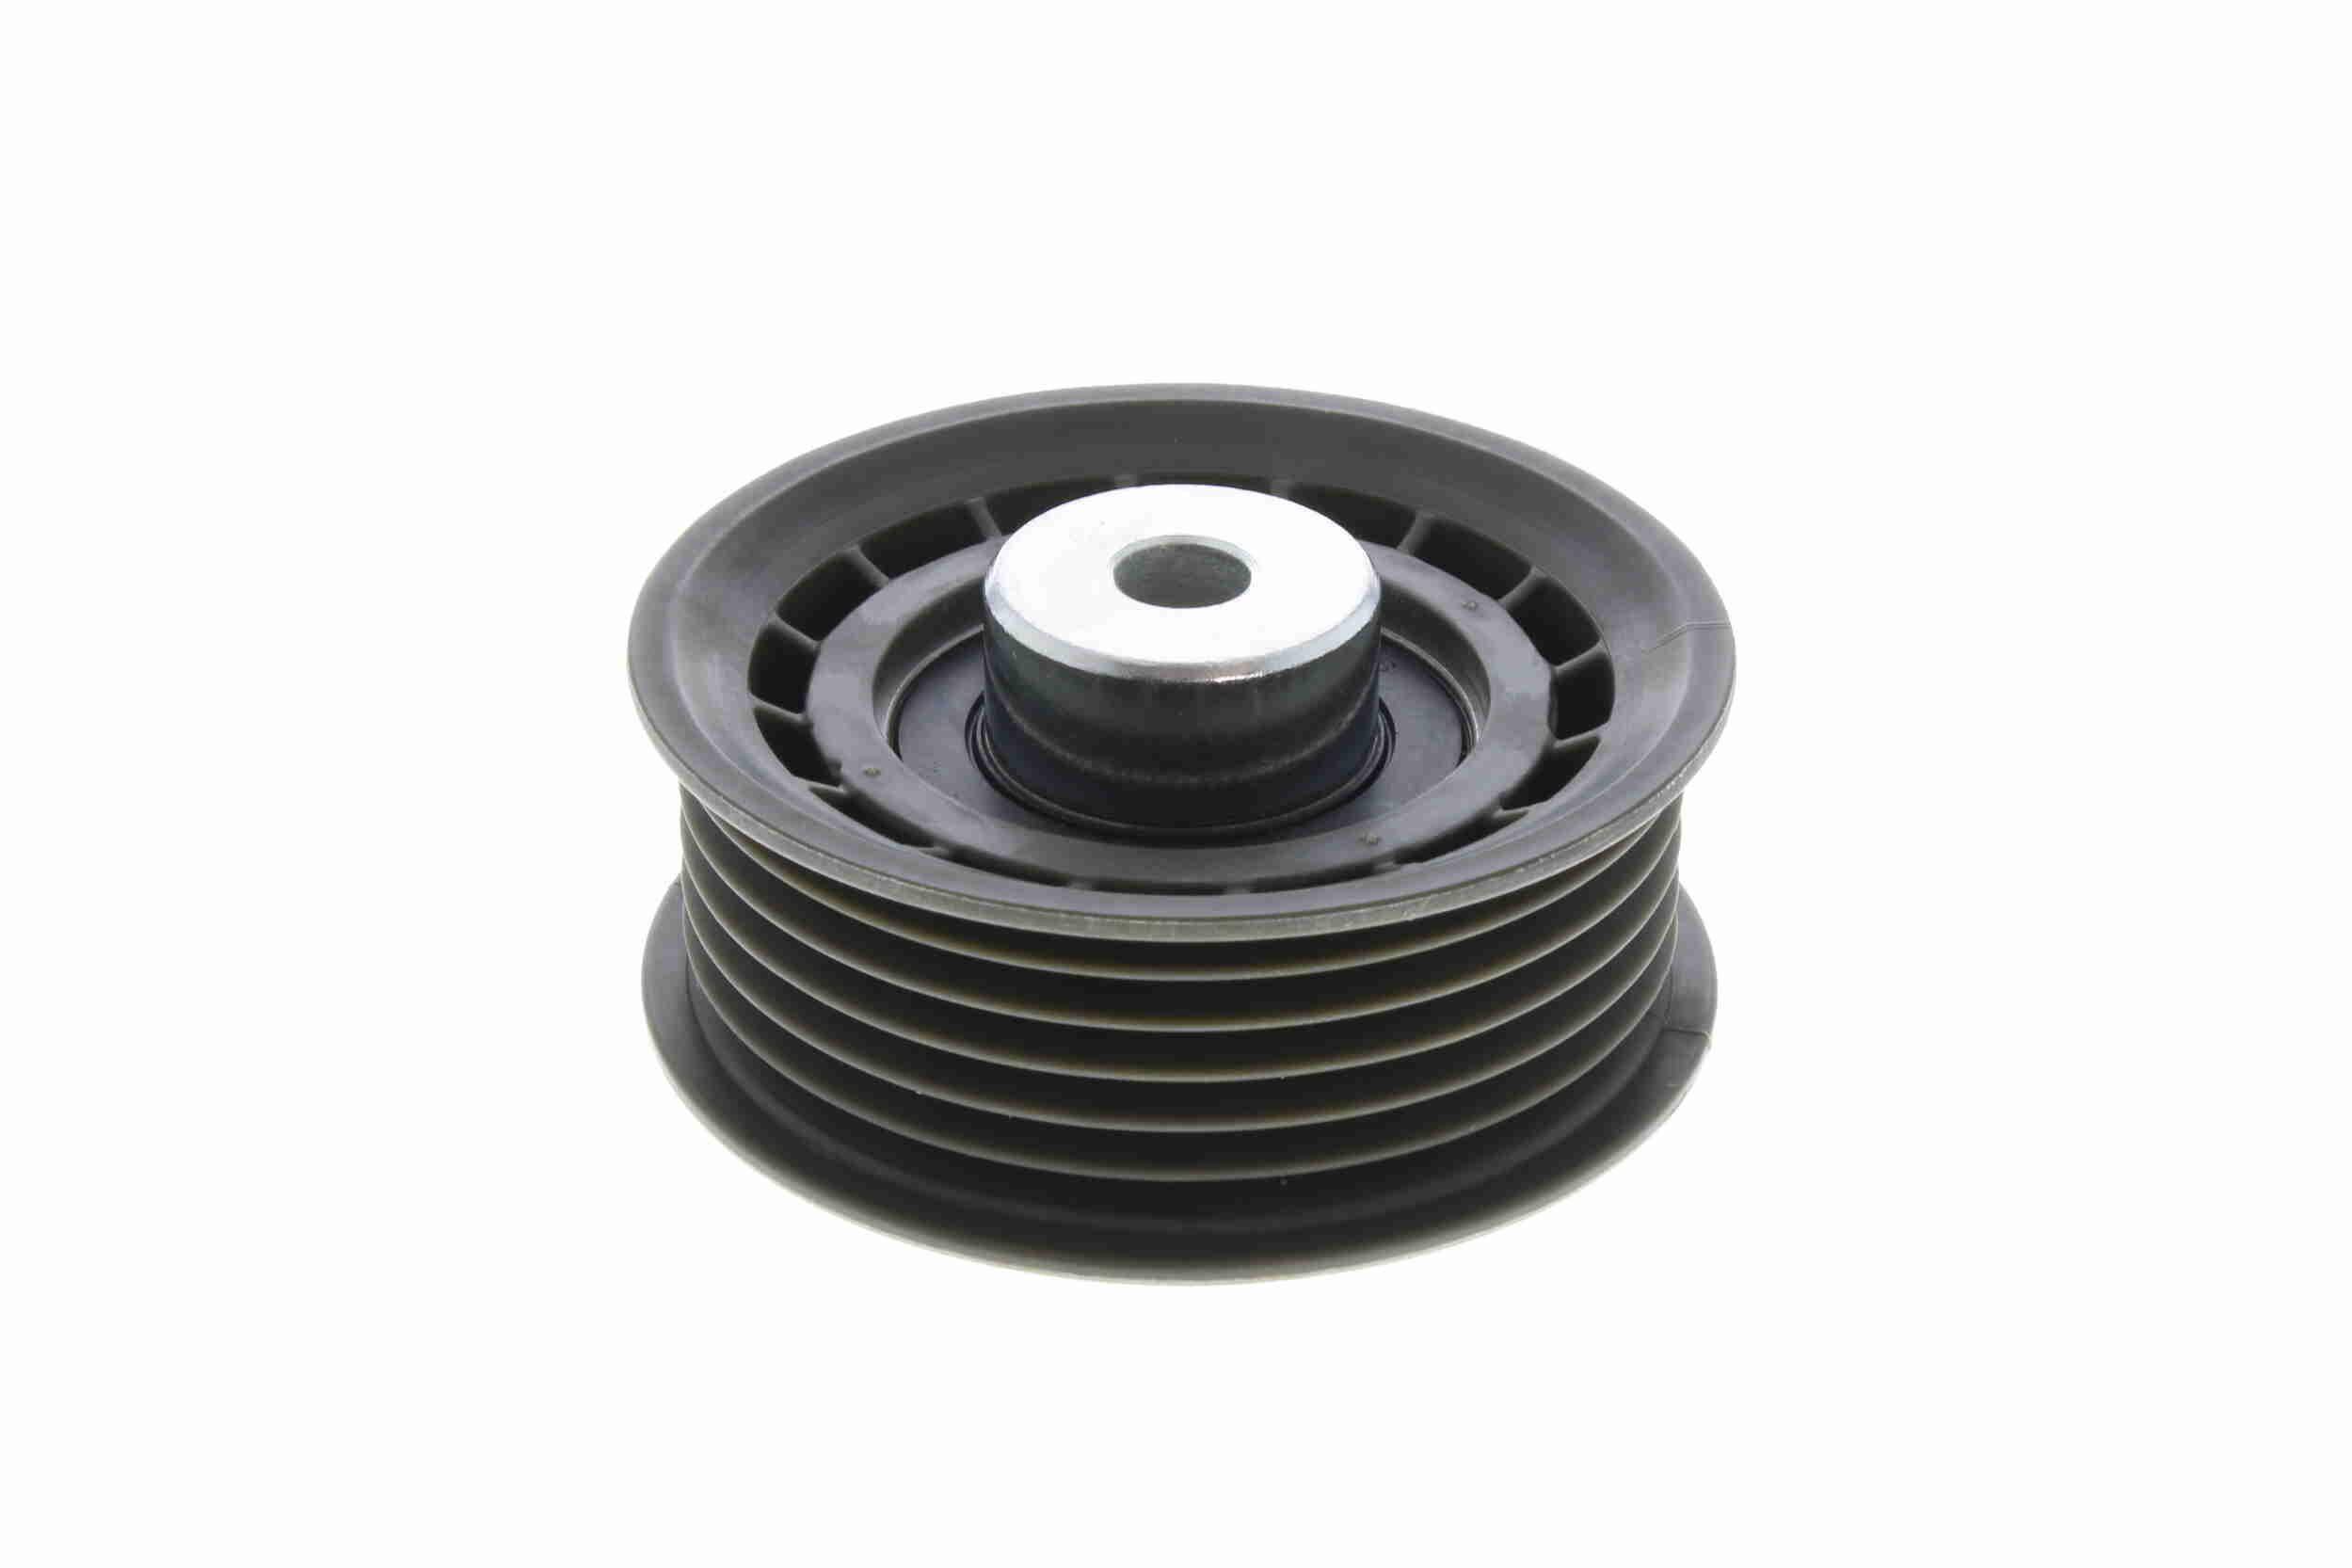 Buy VAICO Deflection / Guide Pulley, v-ribbed belt V30-0133 truck